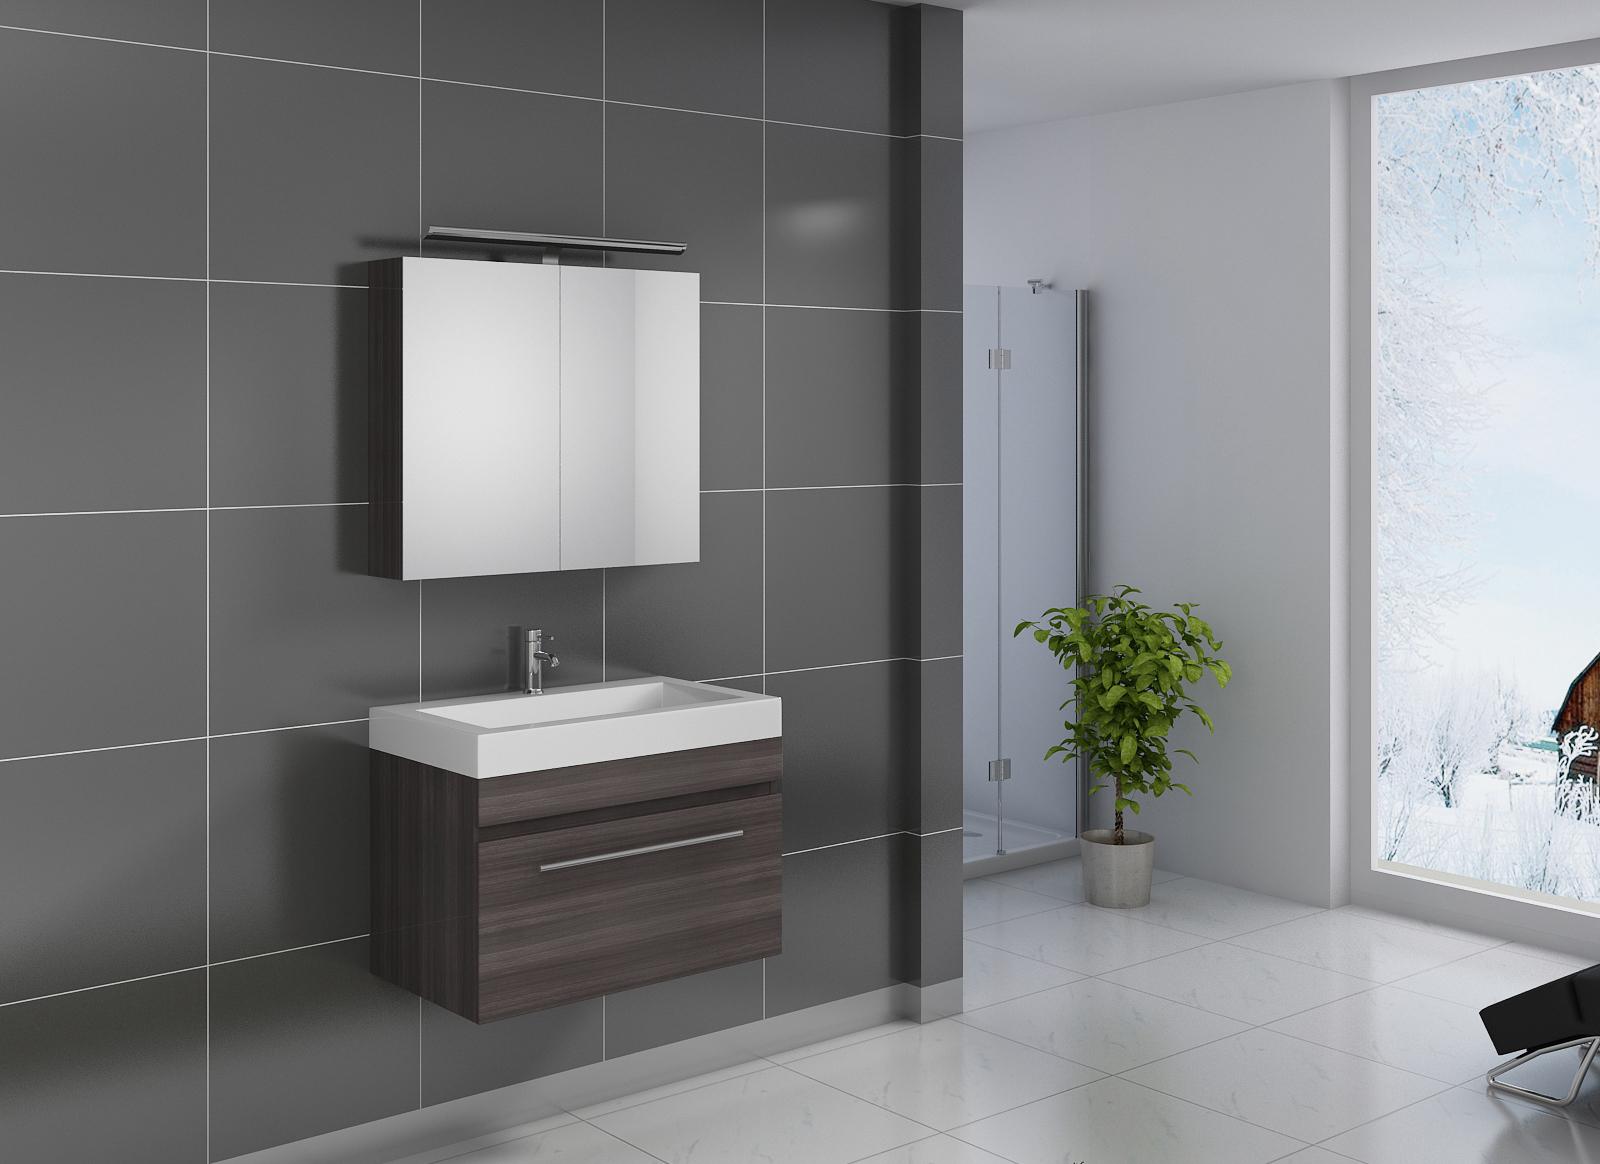 download badezimmer 80 cm | vitaplaza, Badezimmer ideen